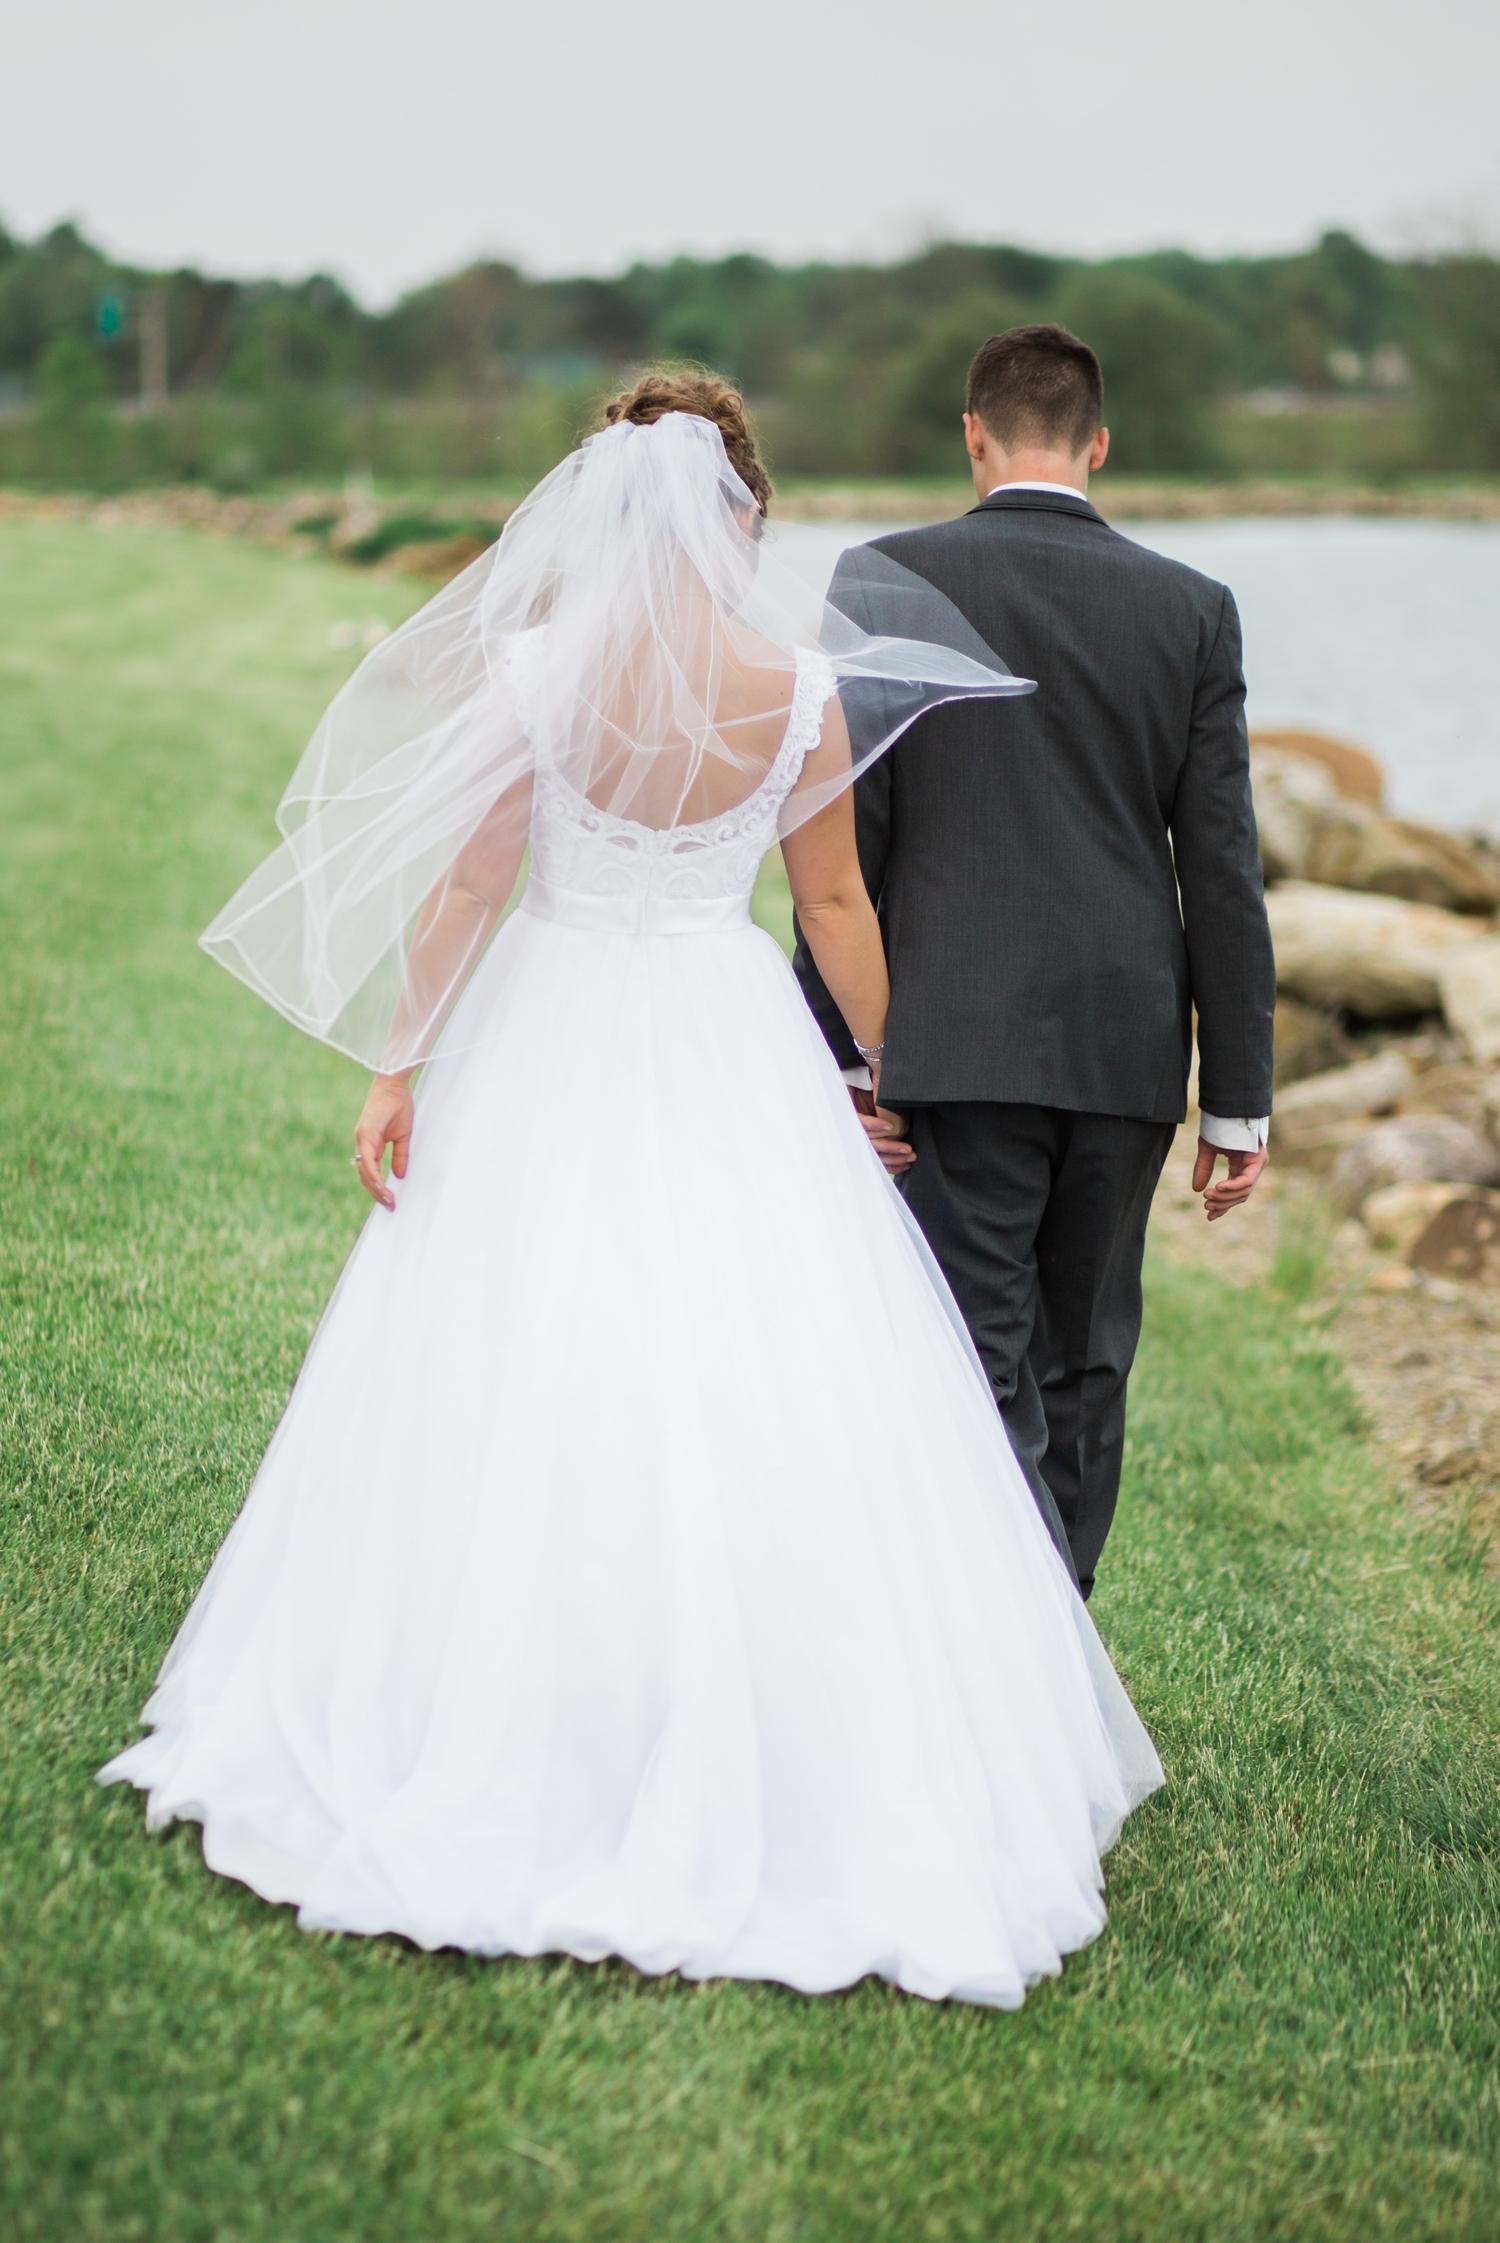 Erin-rusty-youngstown-ohio-wedding-photographer-tracylynn-photography-mill-creek-park-drakes-landing 33.jpg